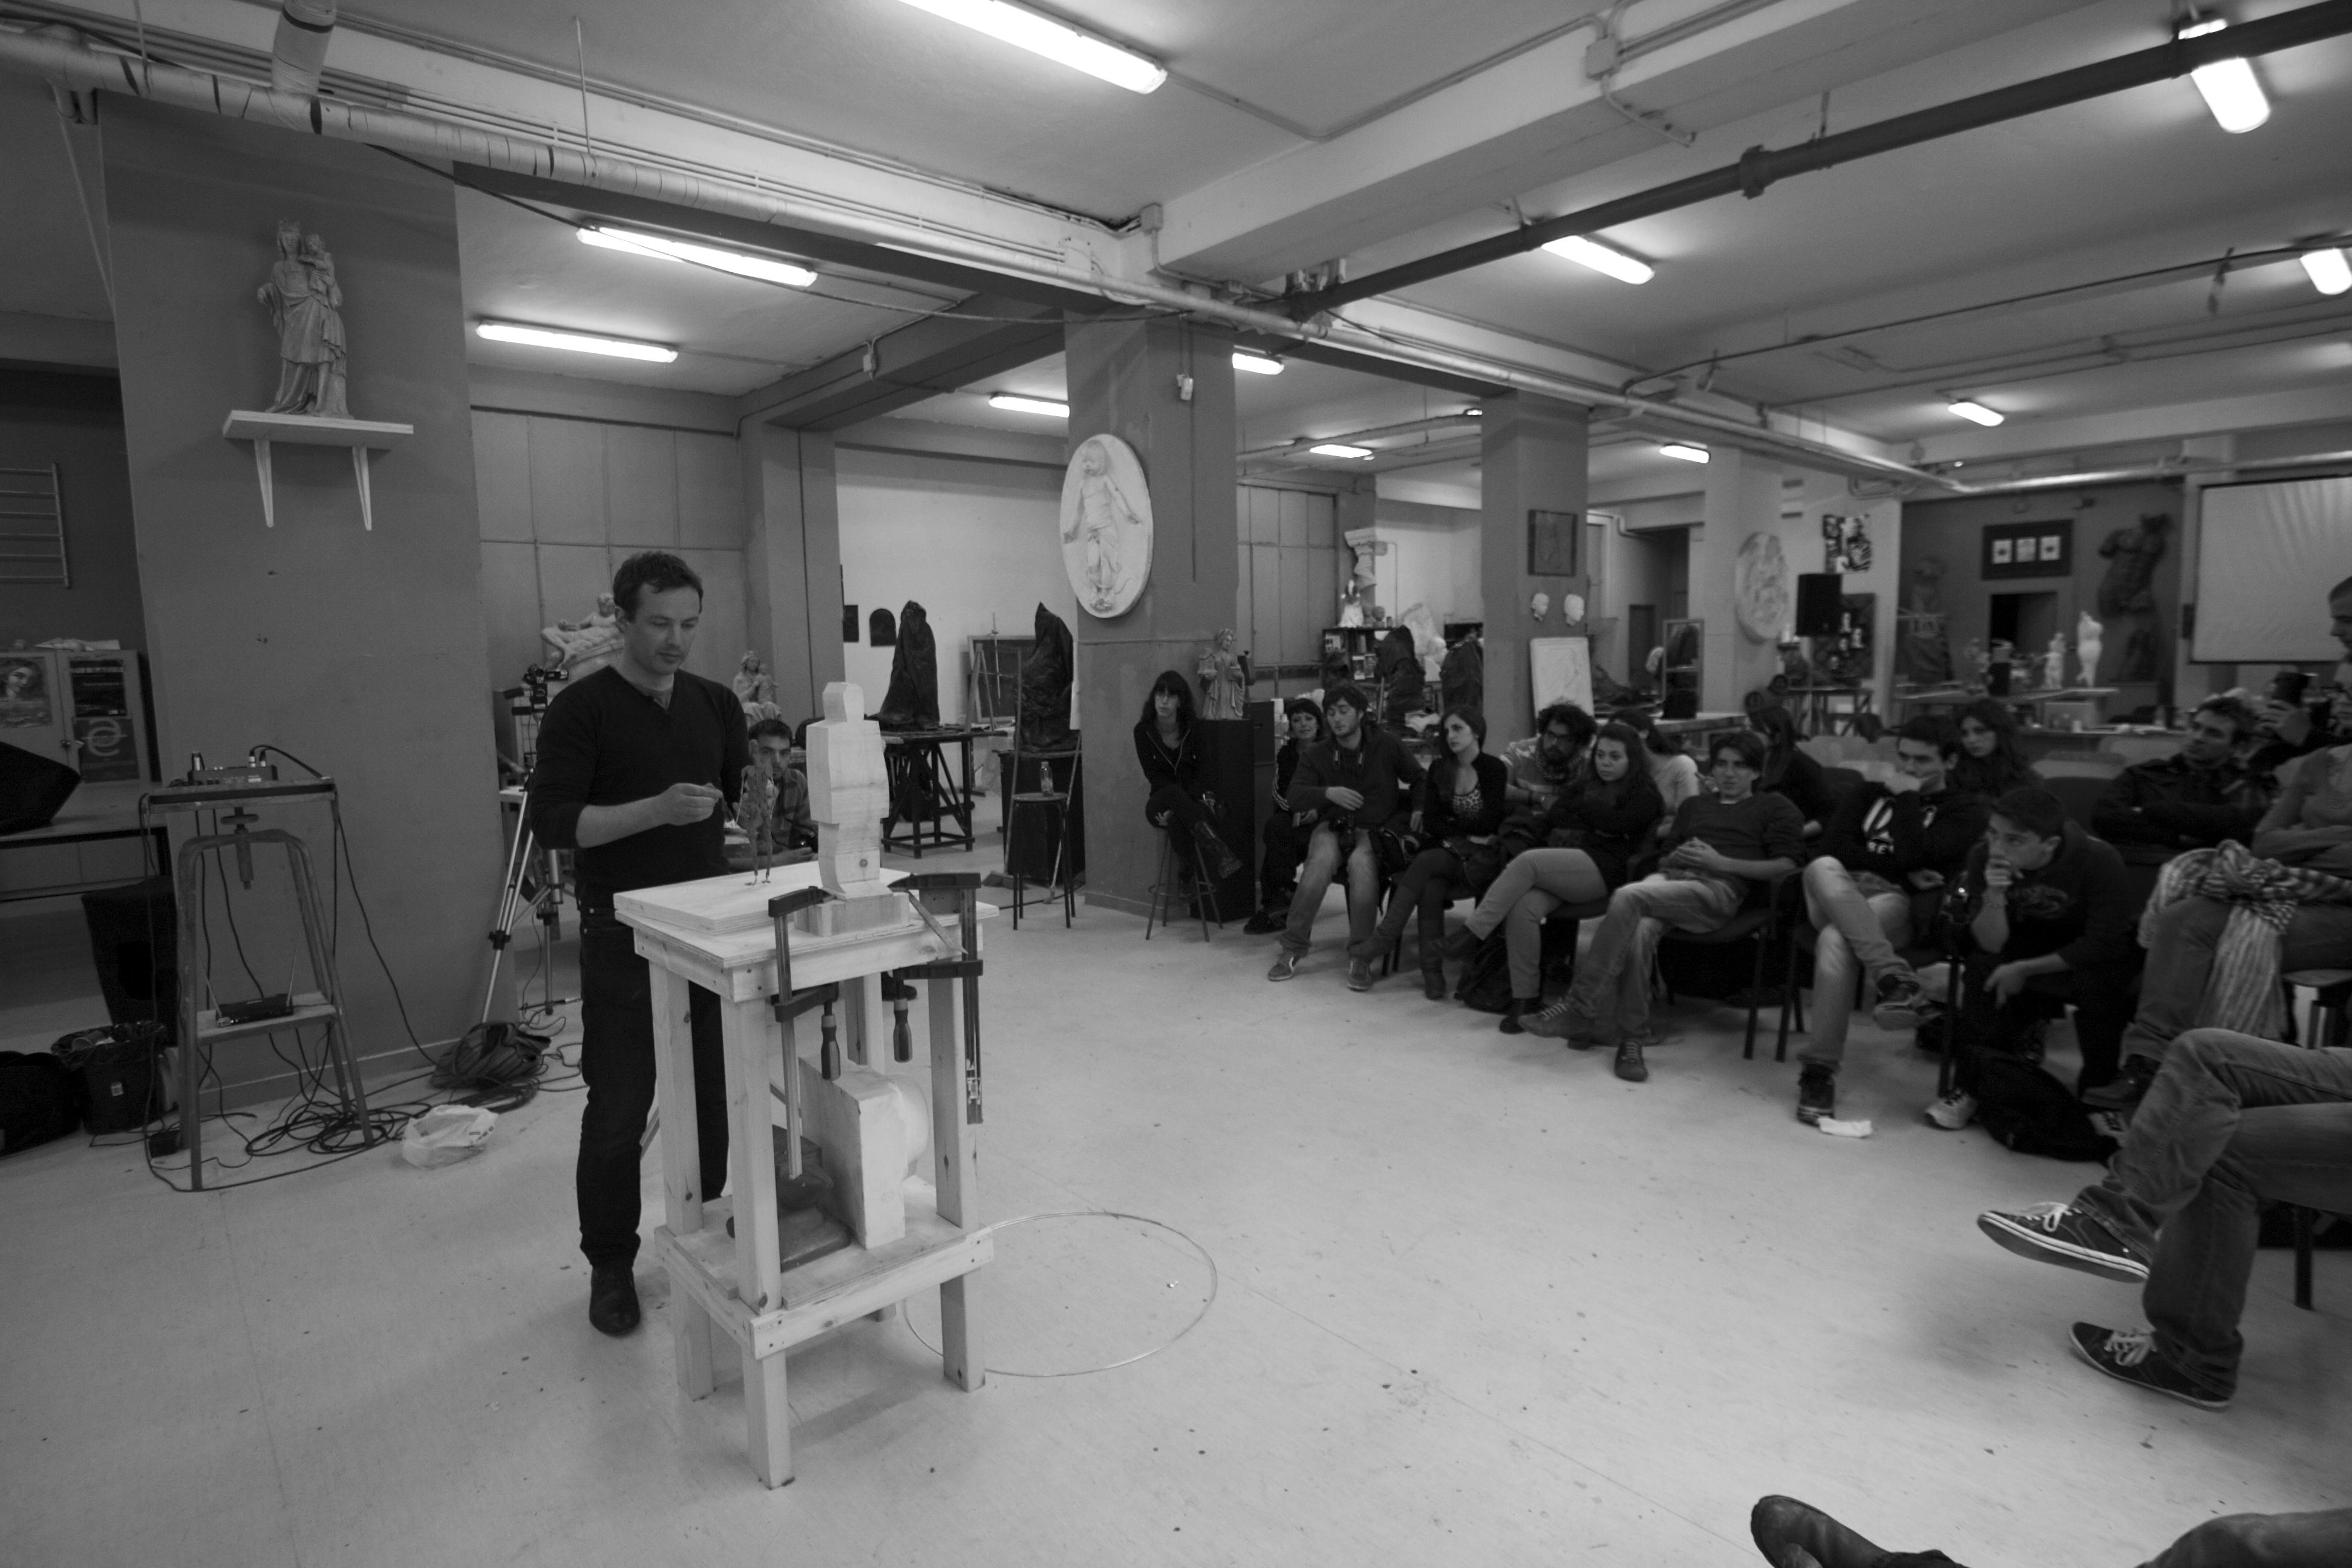 Flickr - Aron Demetz - Dialoghi e materia - Workshop a cura di Franco Reina36